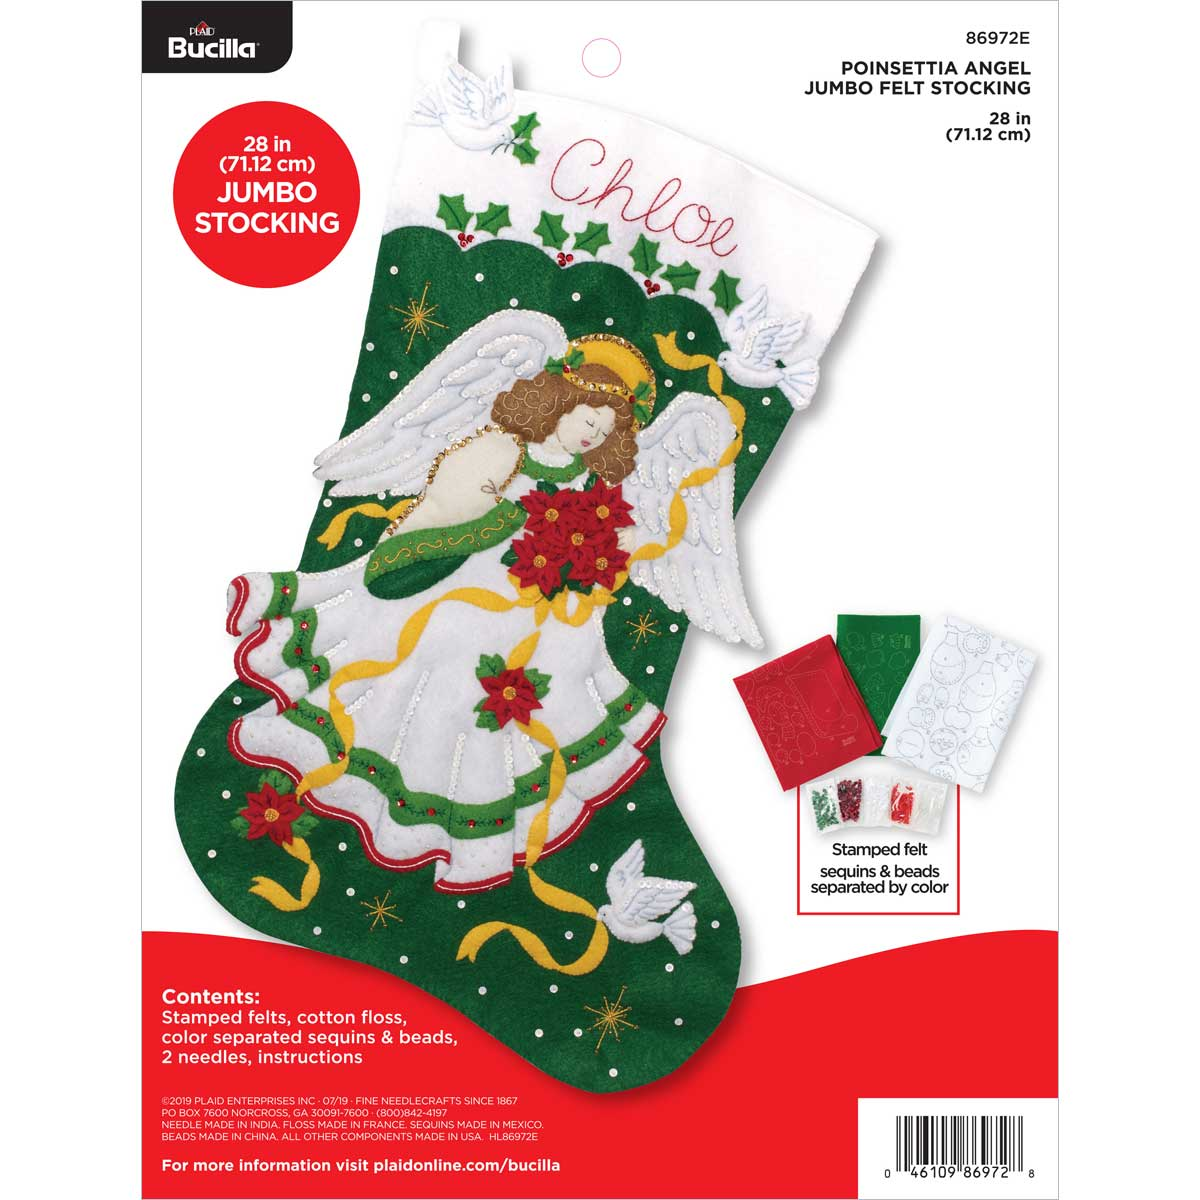 Bucilla ® Seasonal - Felt - Stocking Kits - Poinsettia Angel Jumbo Stocking - 86972E